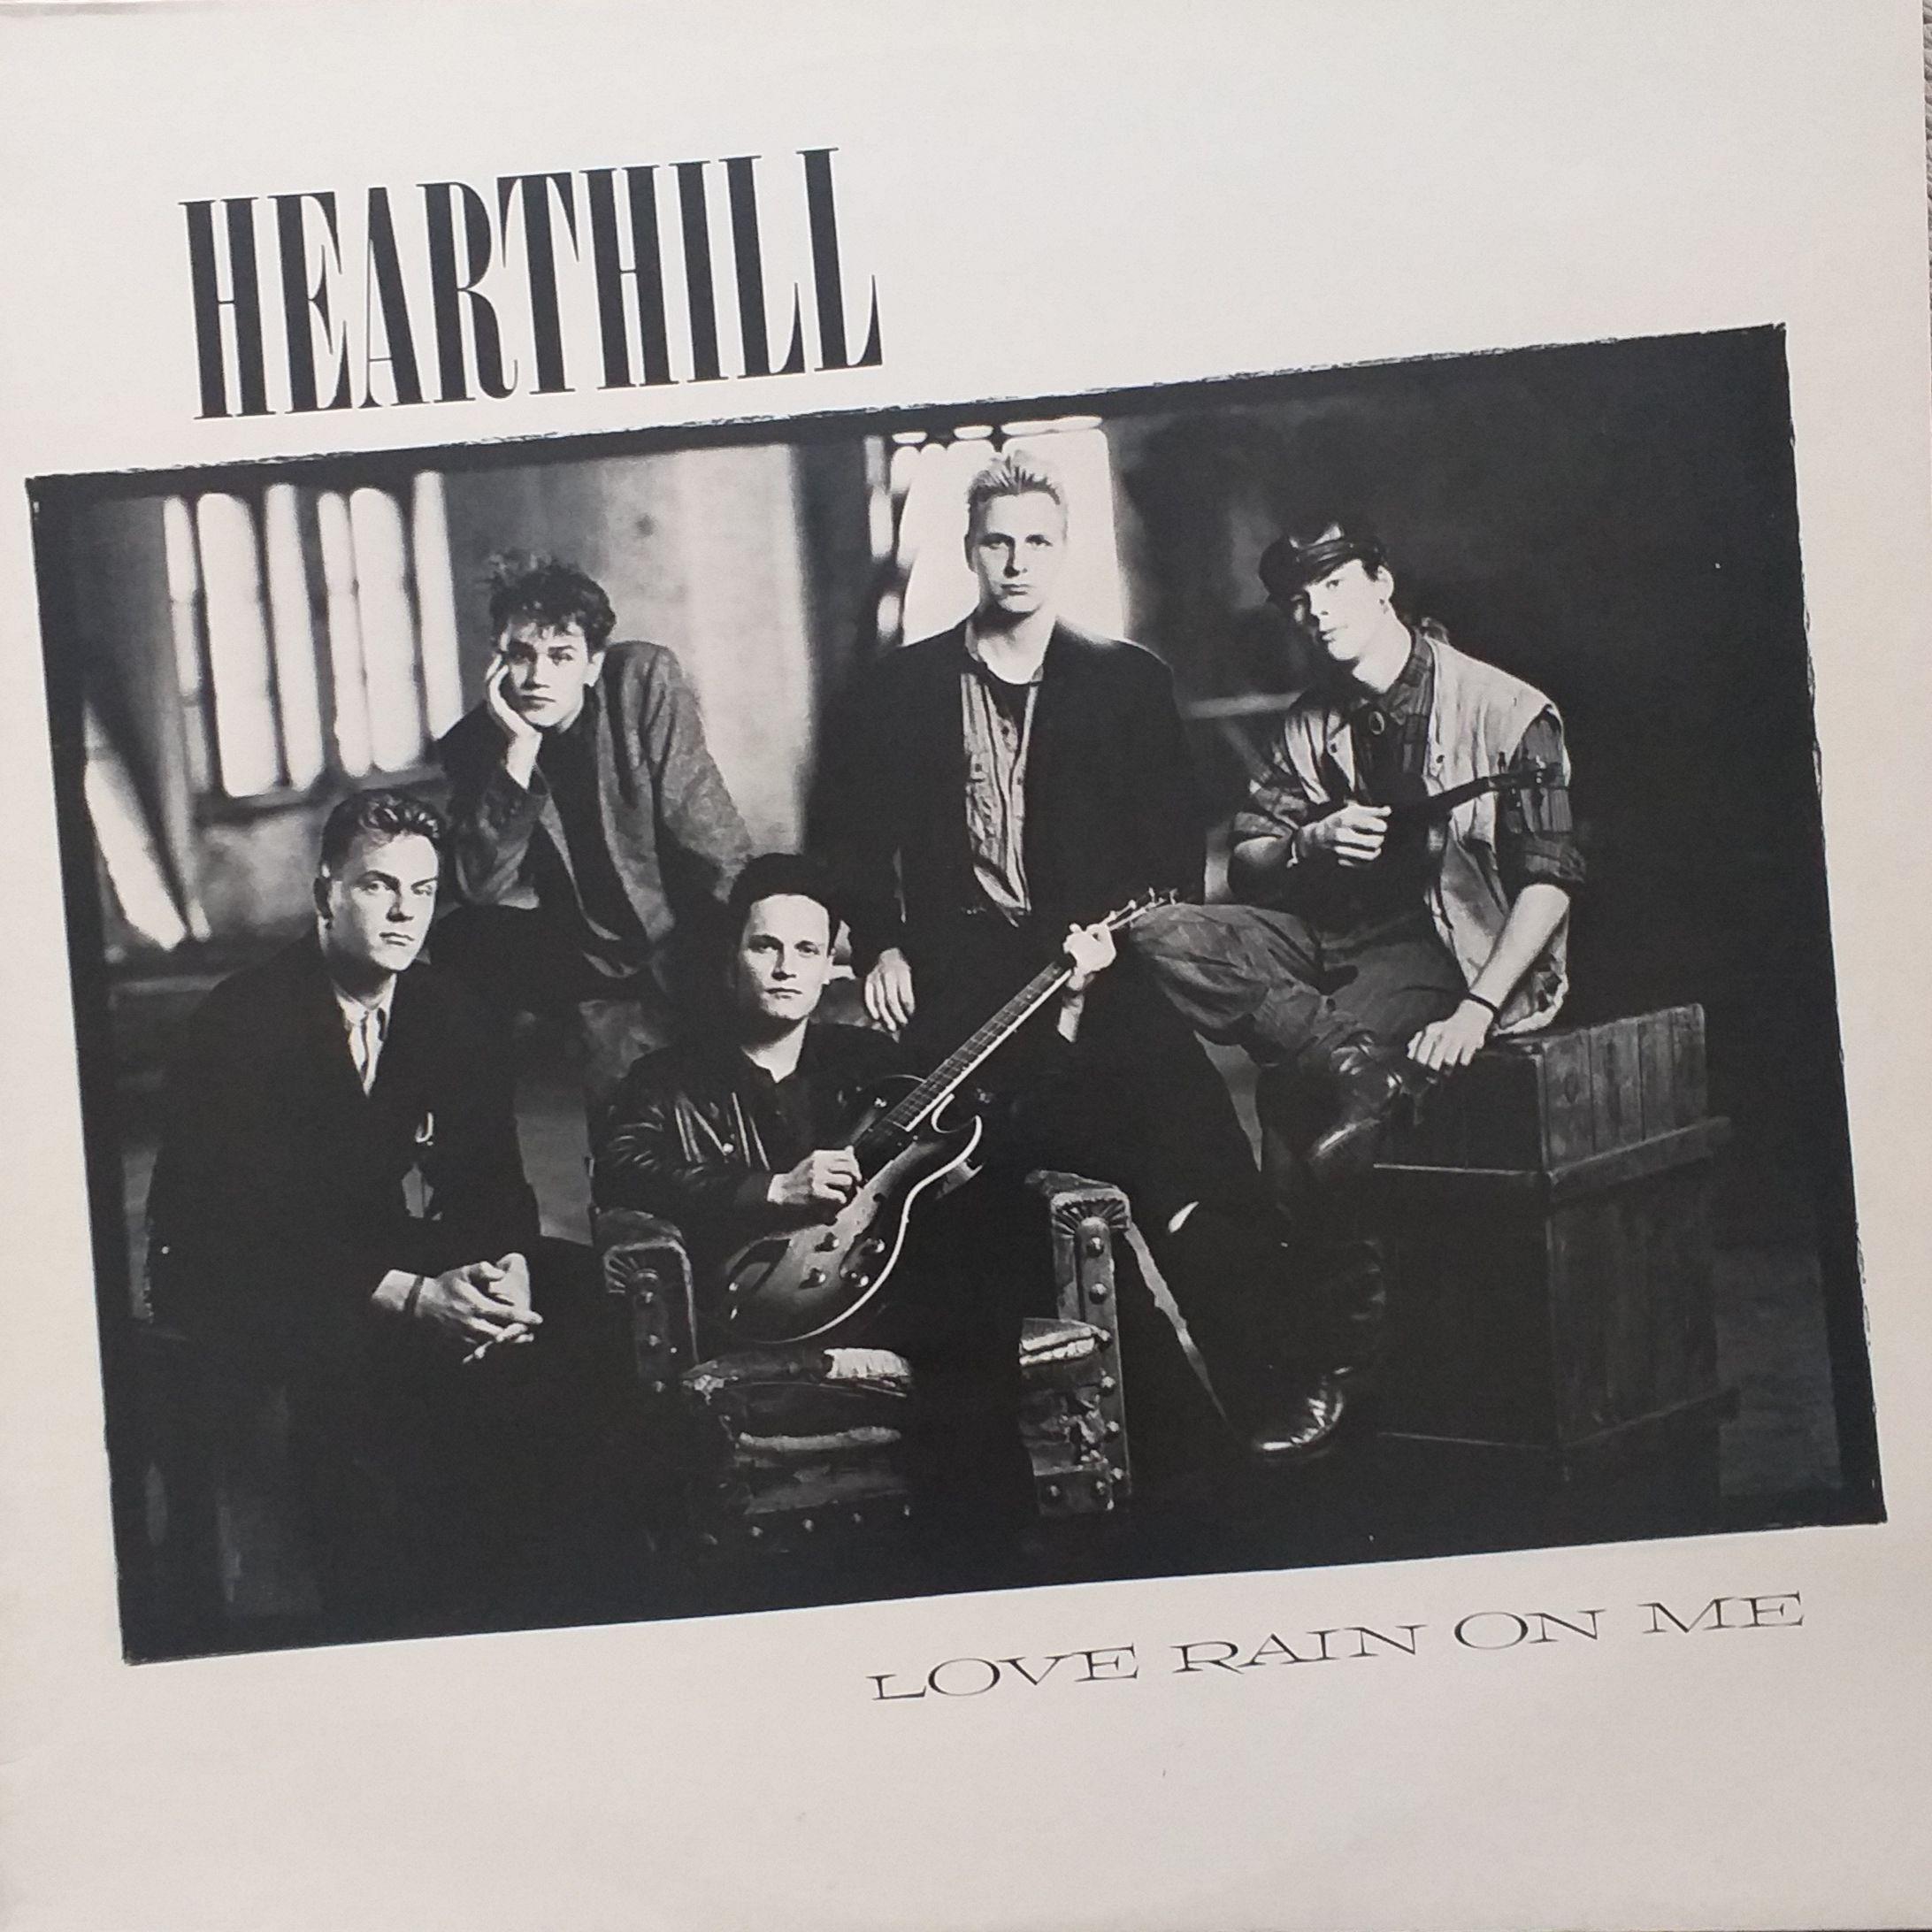 Hearthill Love rain on me LP undefined